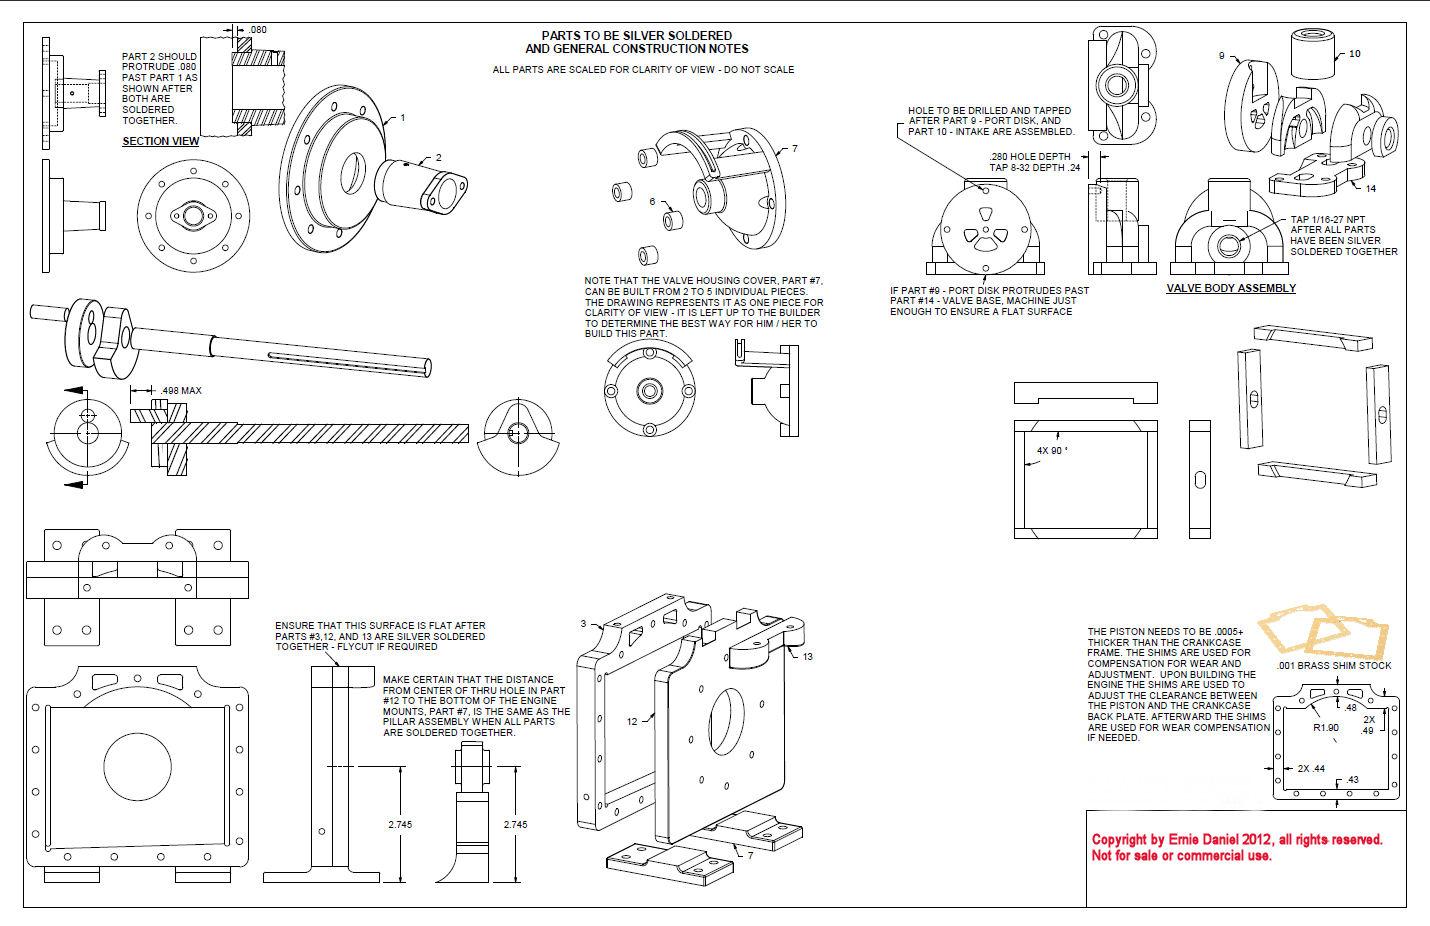 Dake-Ernie-Daniel-Page-13.jpg